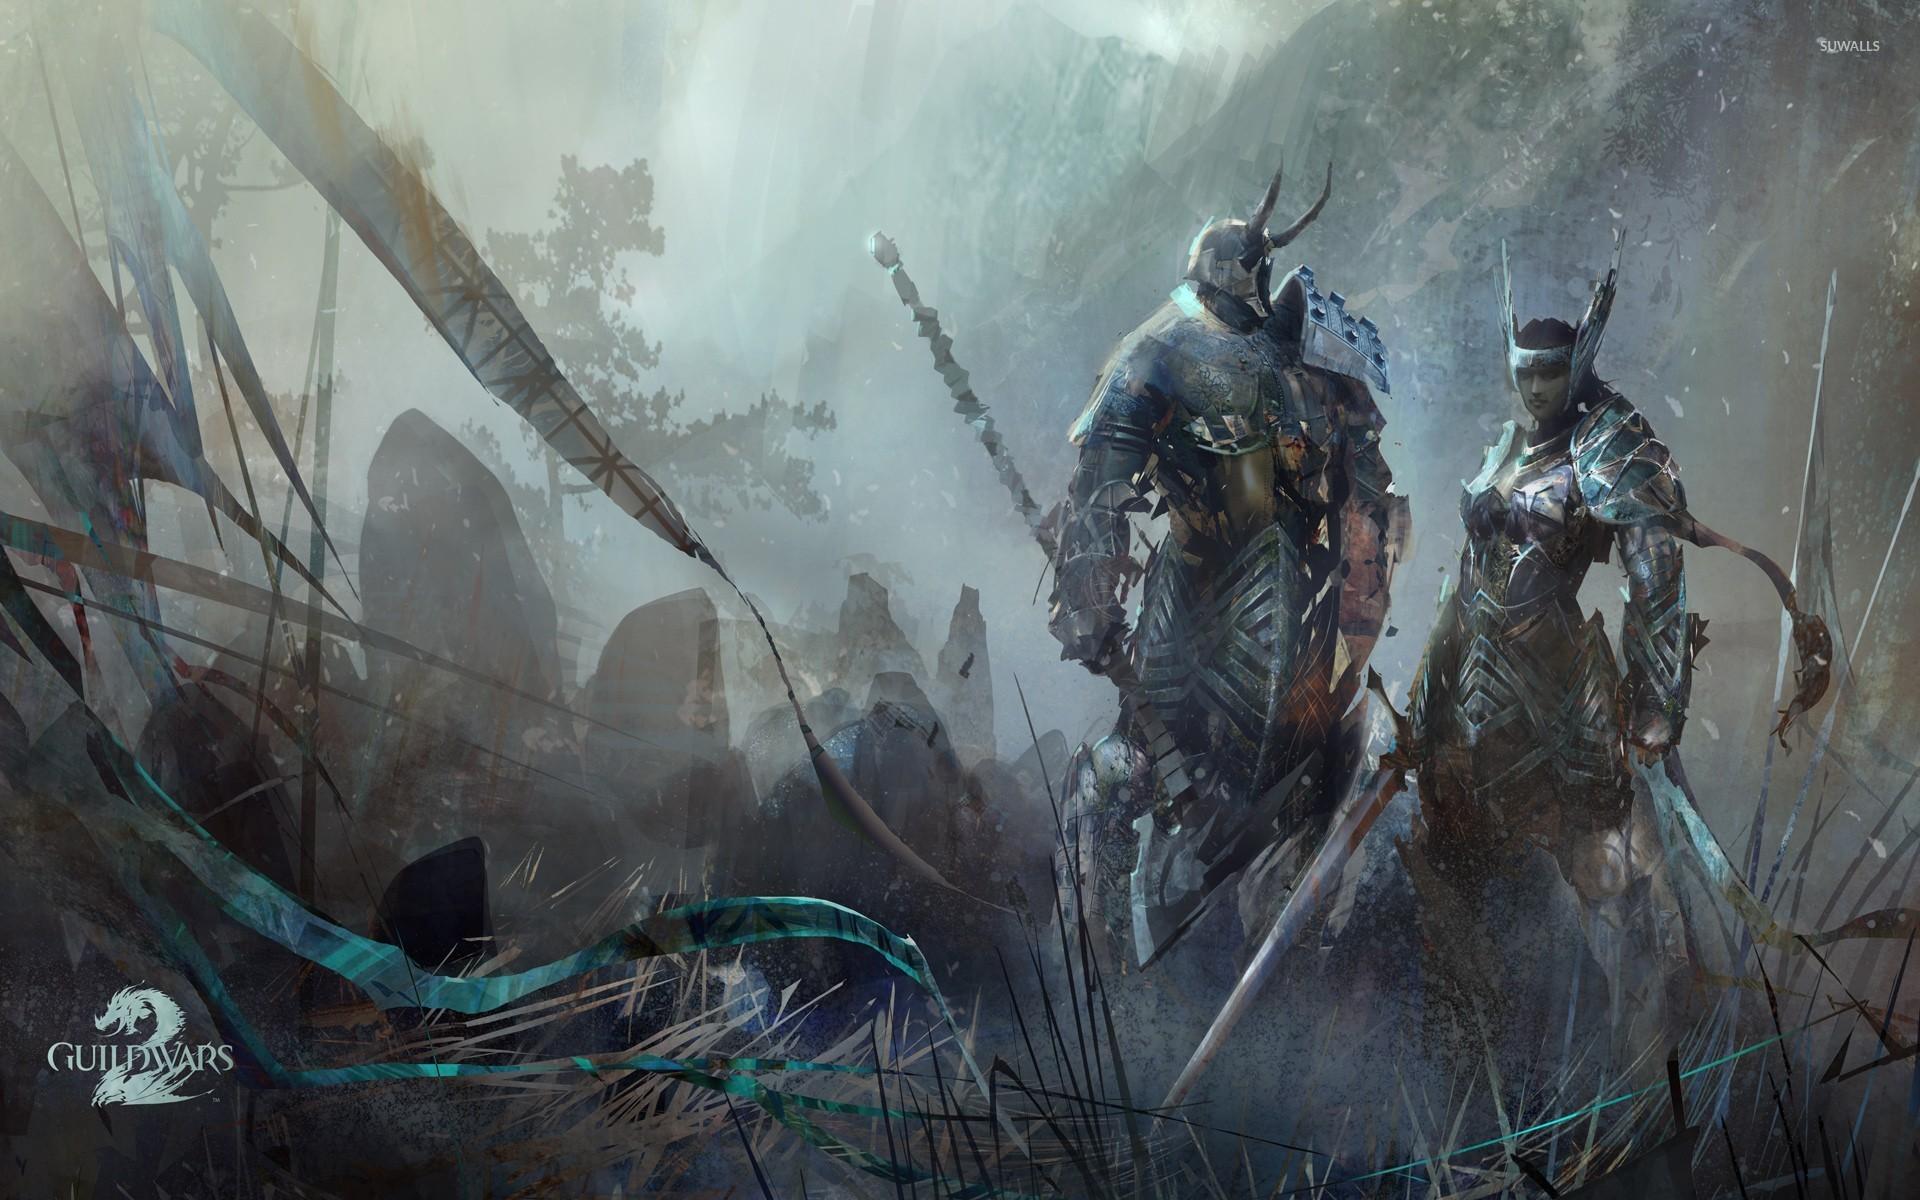 Norn Guild Wars 2 Wallpaper Game Wallpapers 29695